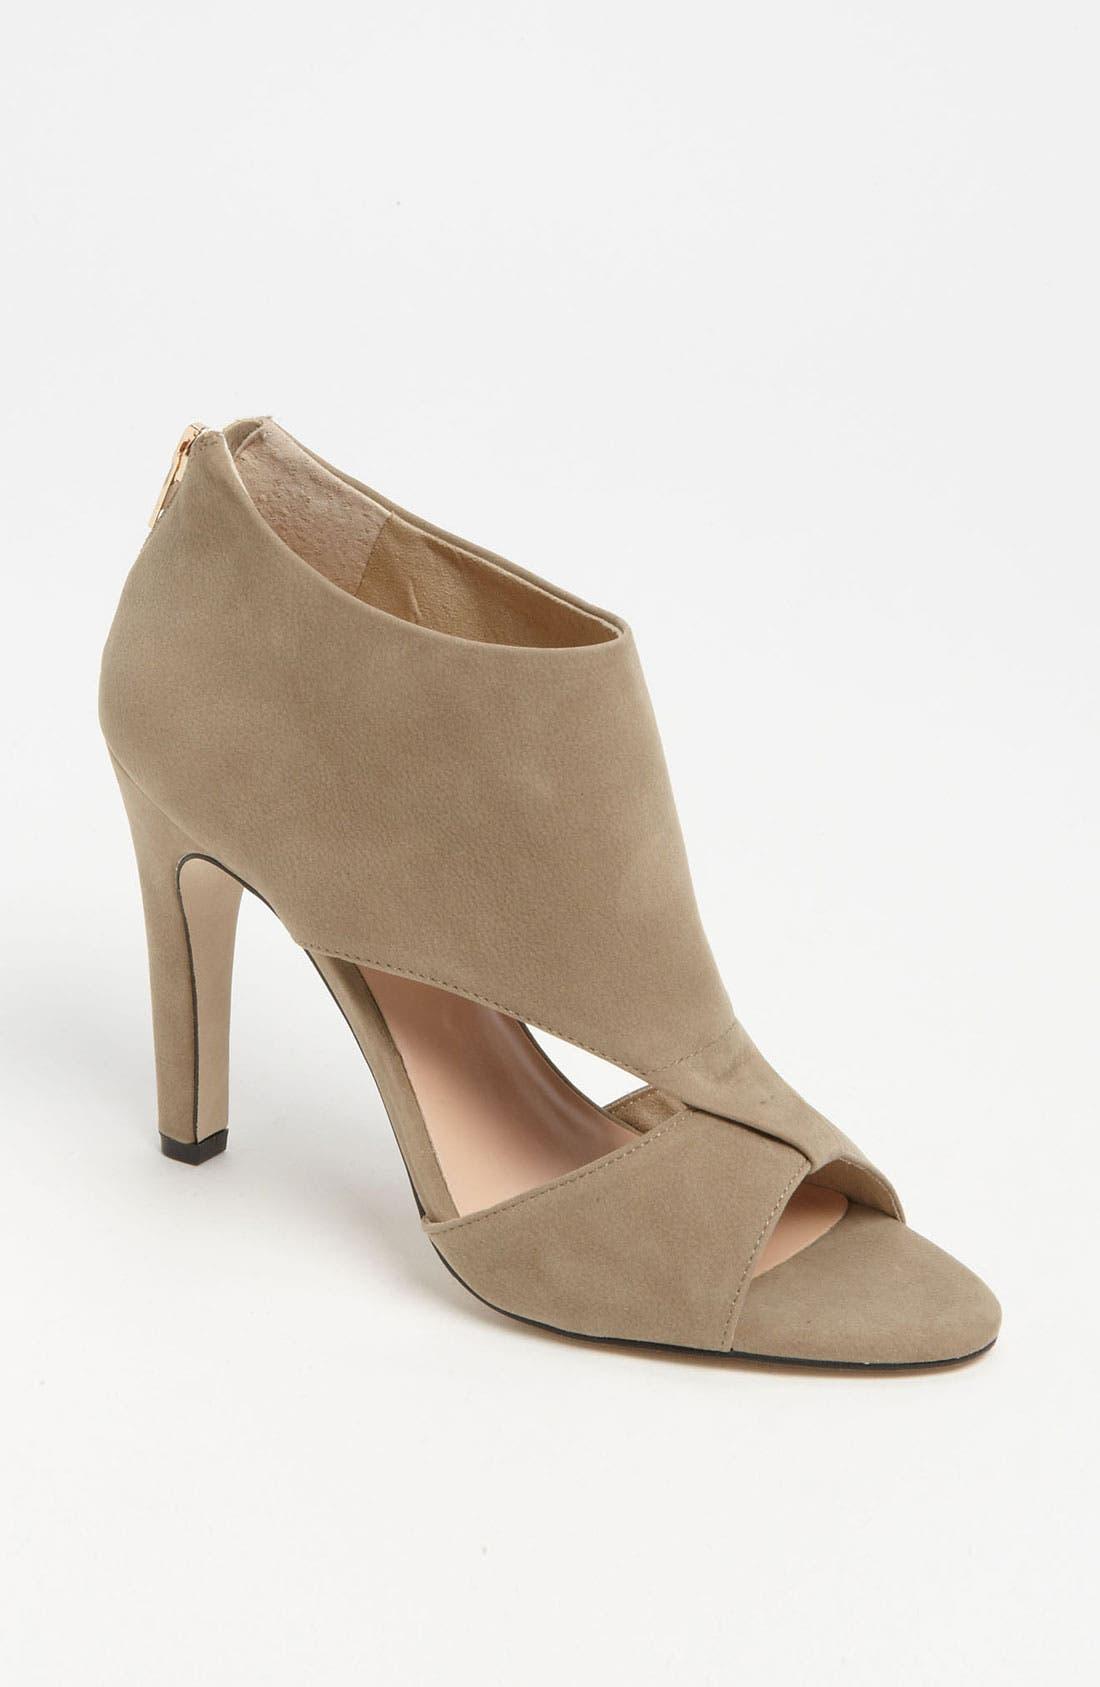 Alternate Image 1 Selected - Sole Society 'Pamelina' Sandal